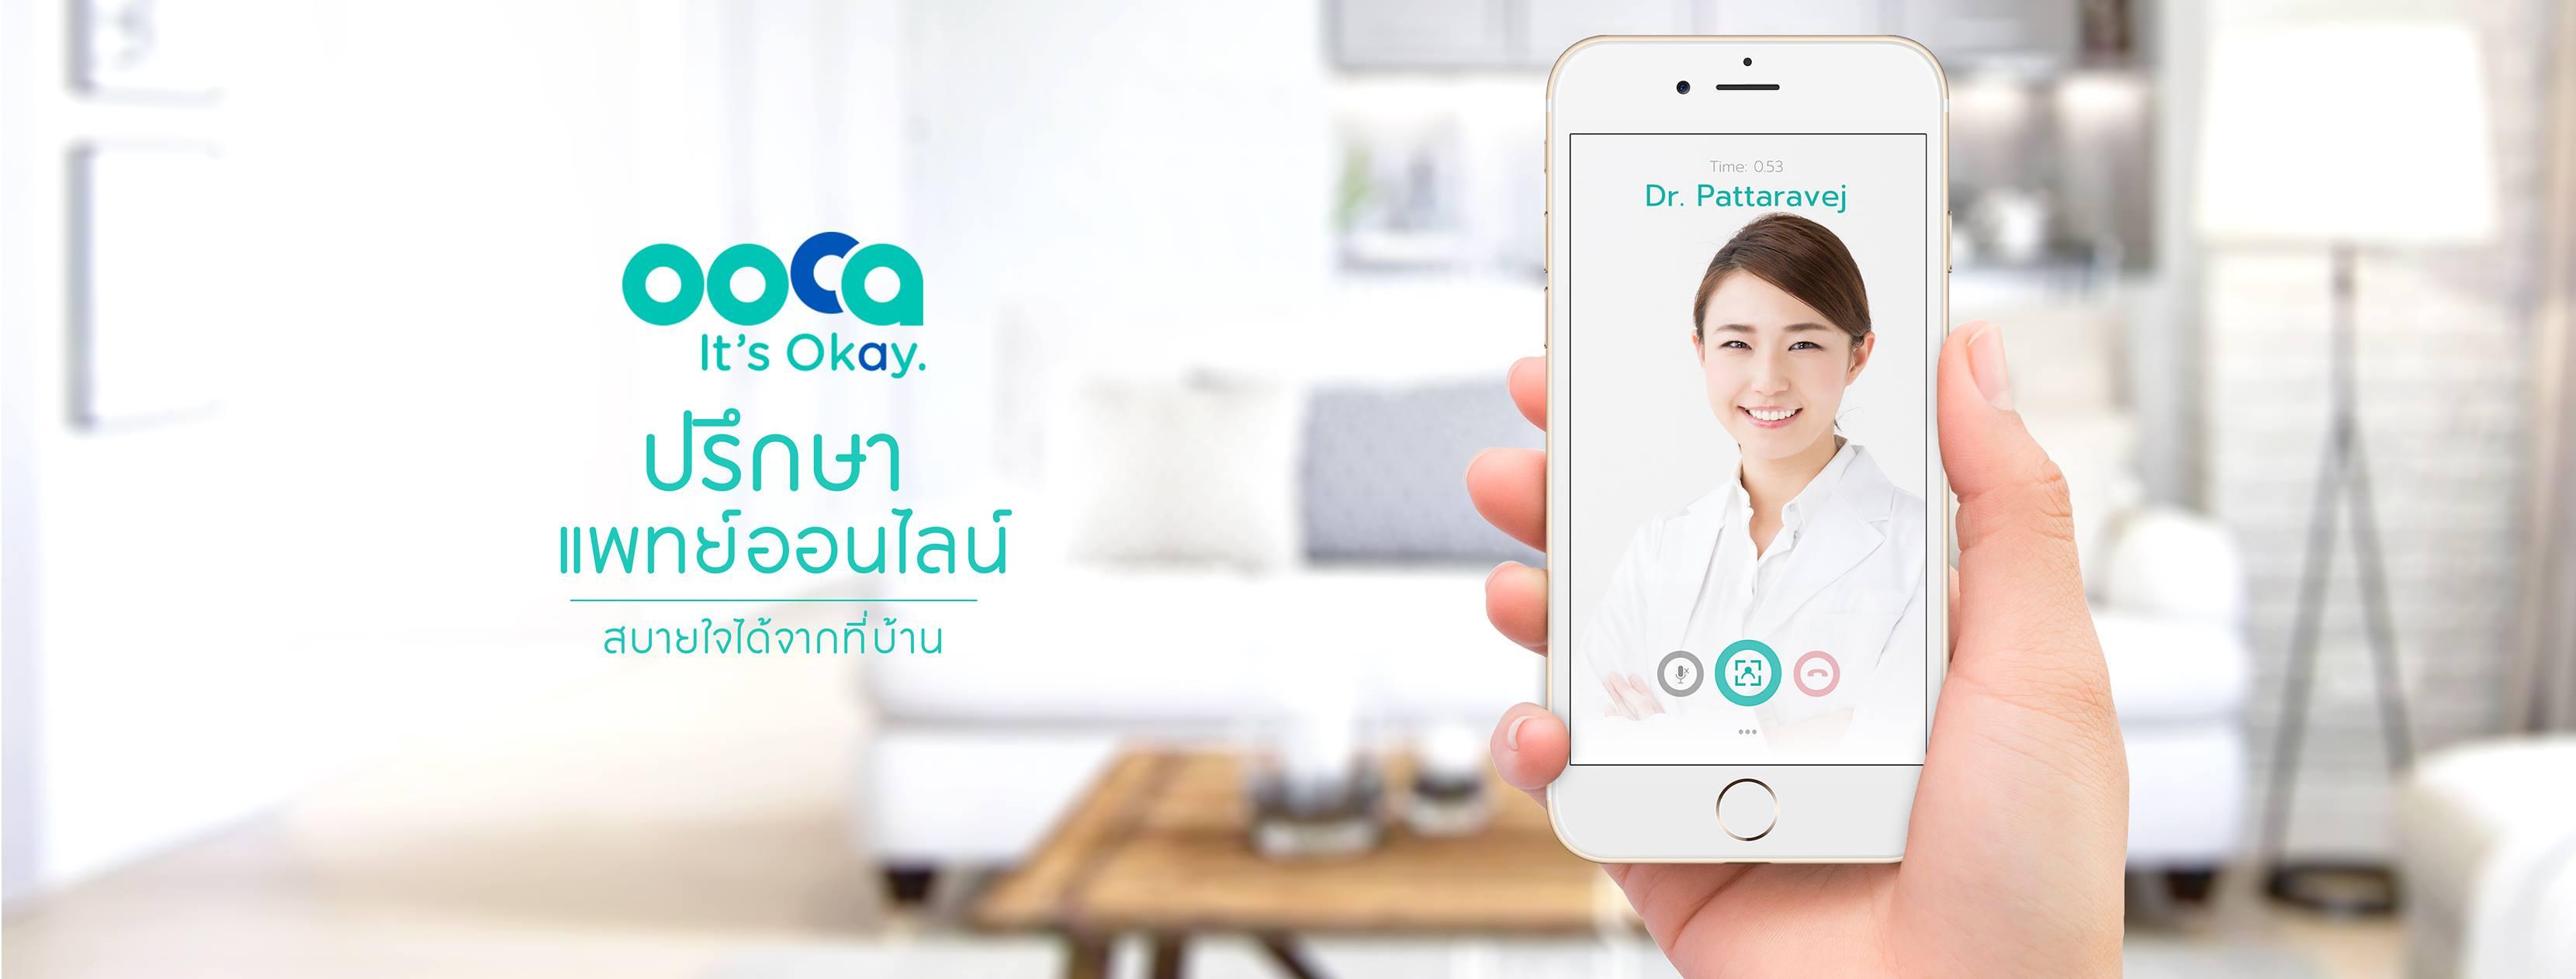 OOCA App